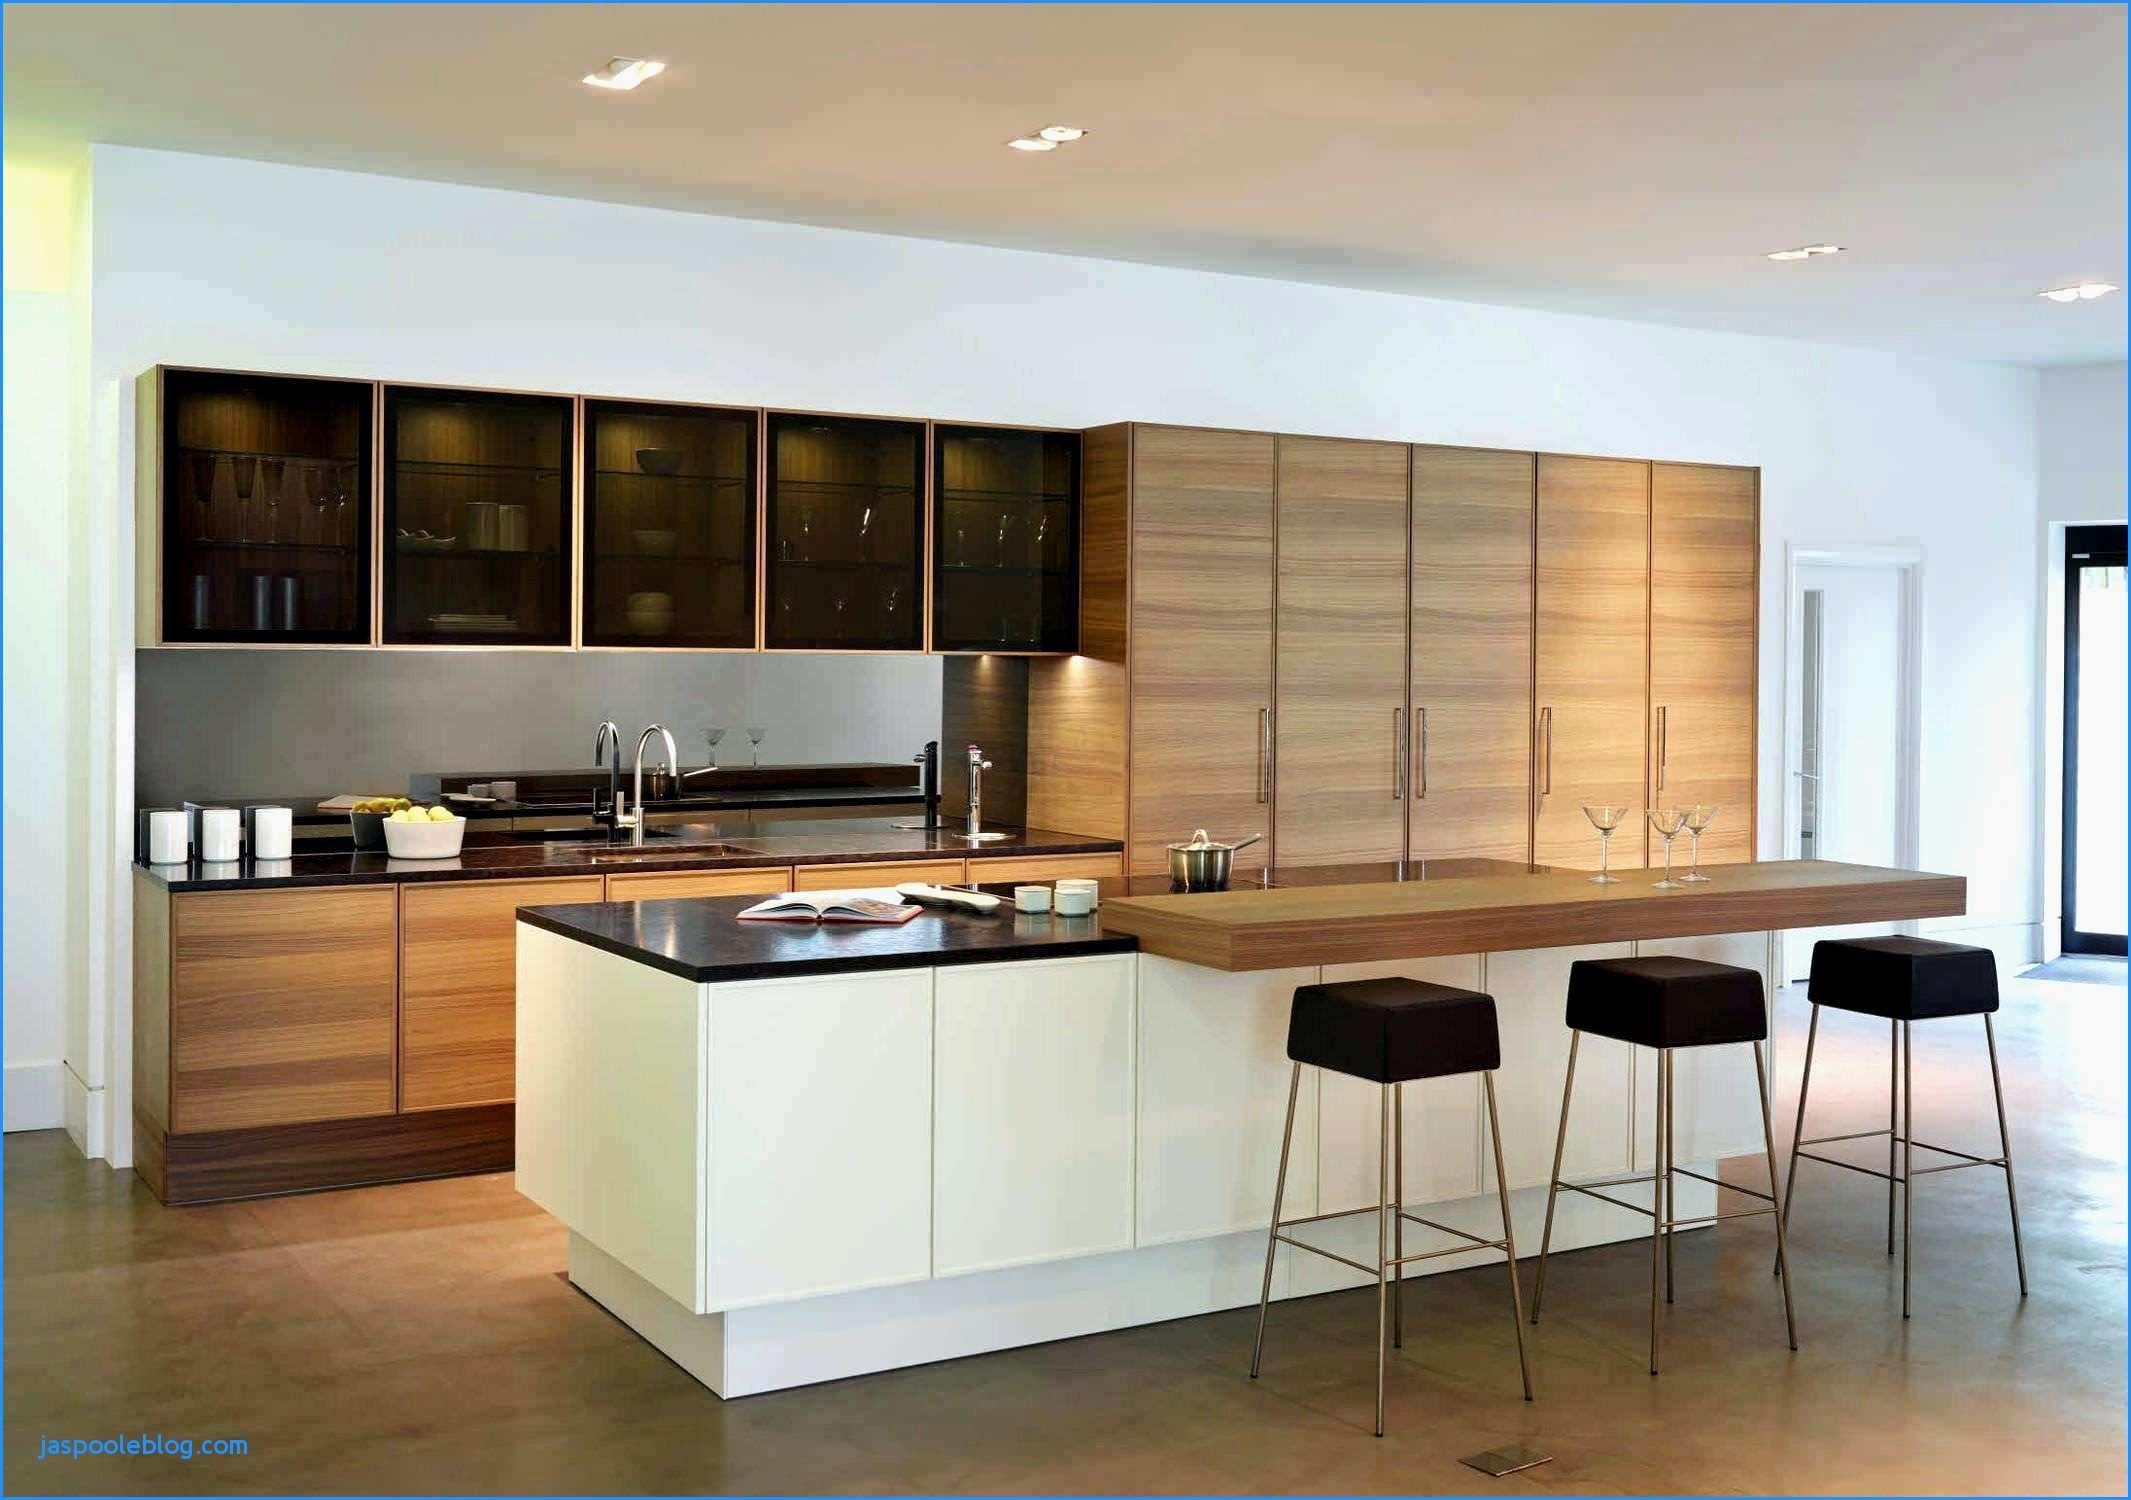 Oggettistica Casa Moderna Top Cucina Brico Moderne Le Bureau De Cette Maison Mod Interior Design Kitchen Modern Kitchen Design Kitchen Cabinets And Countertops